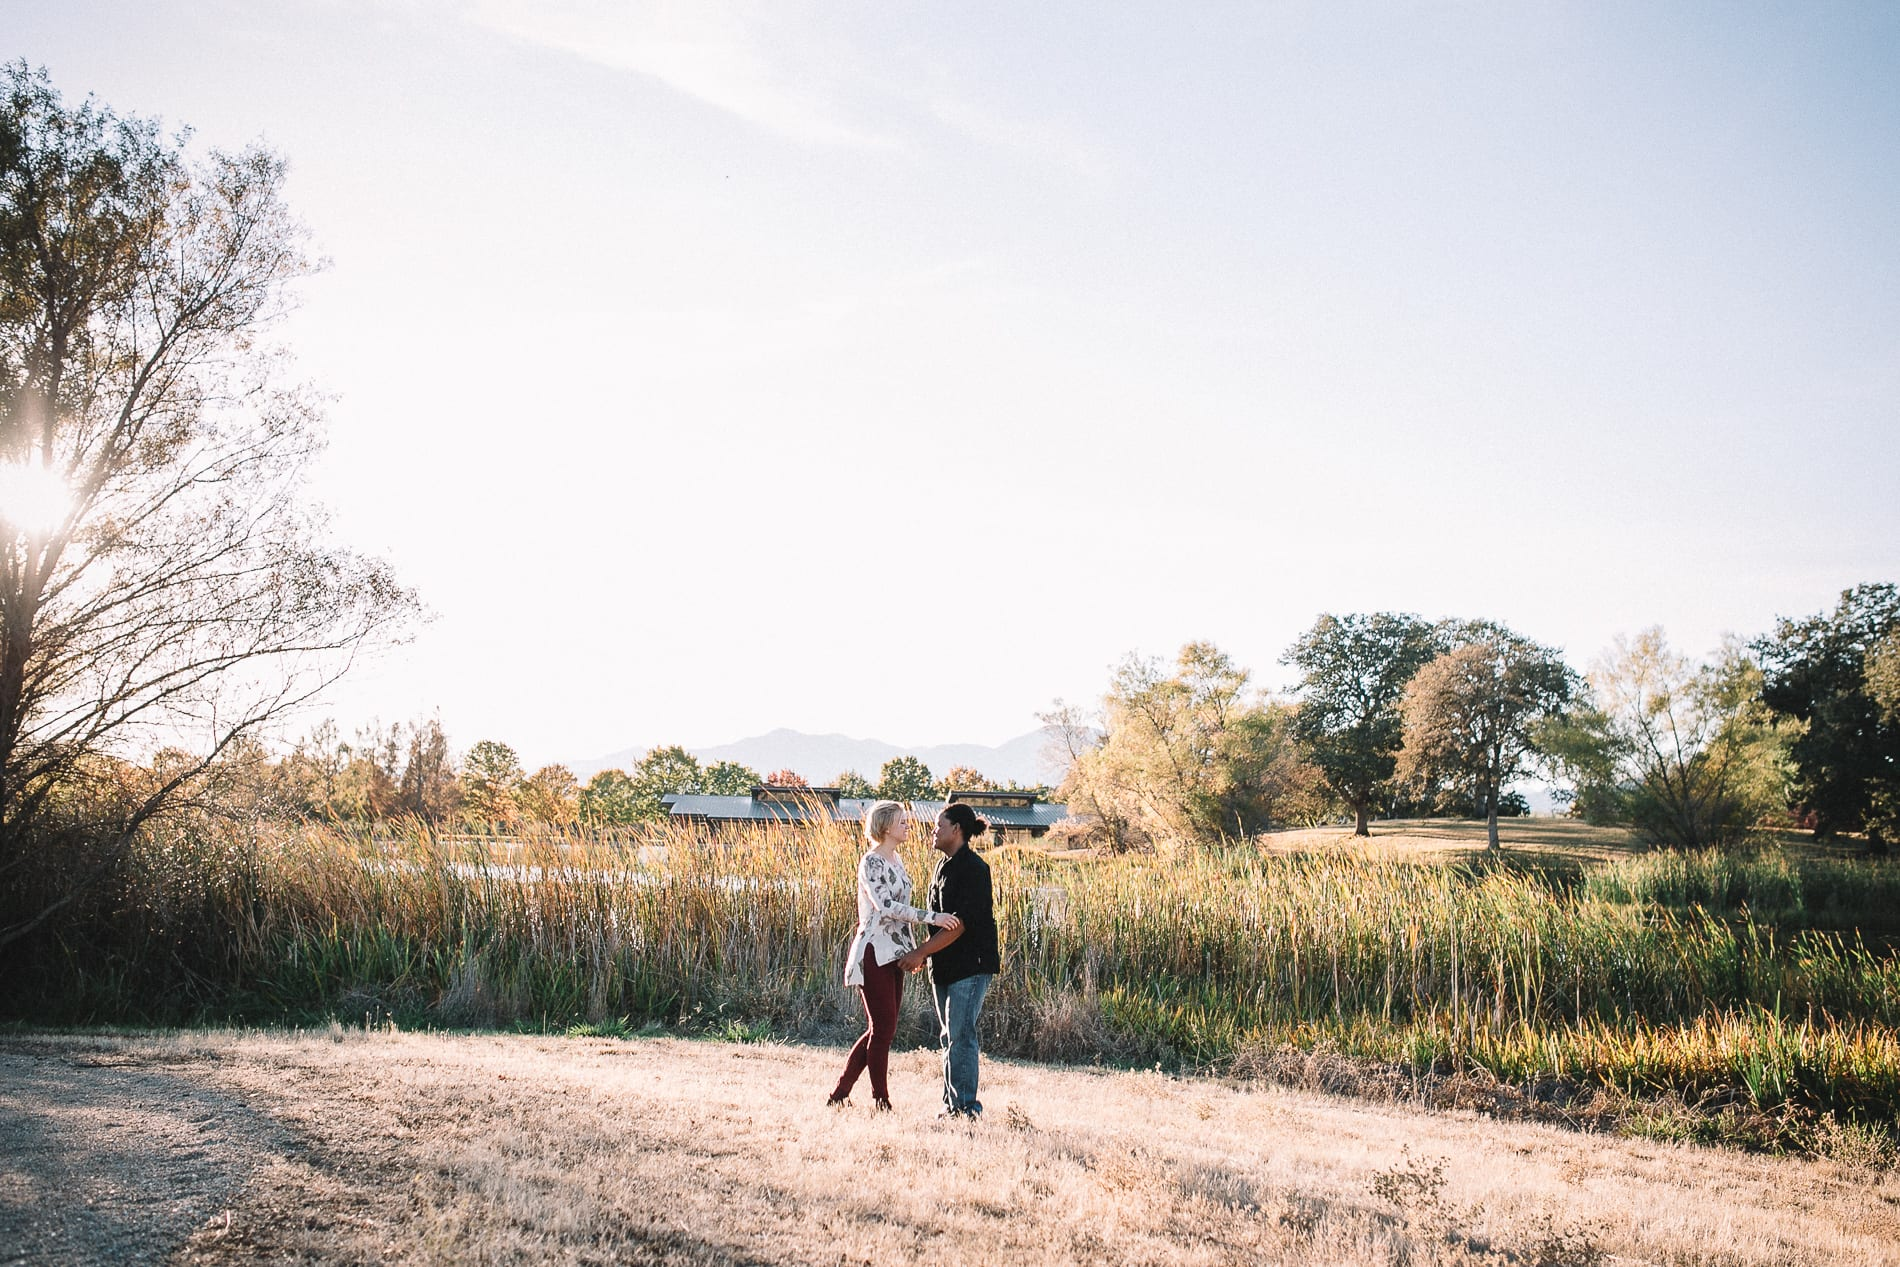 redding-lema-ranch-engagement-photo-11